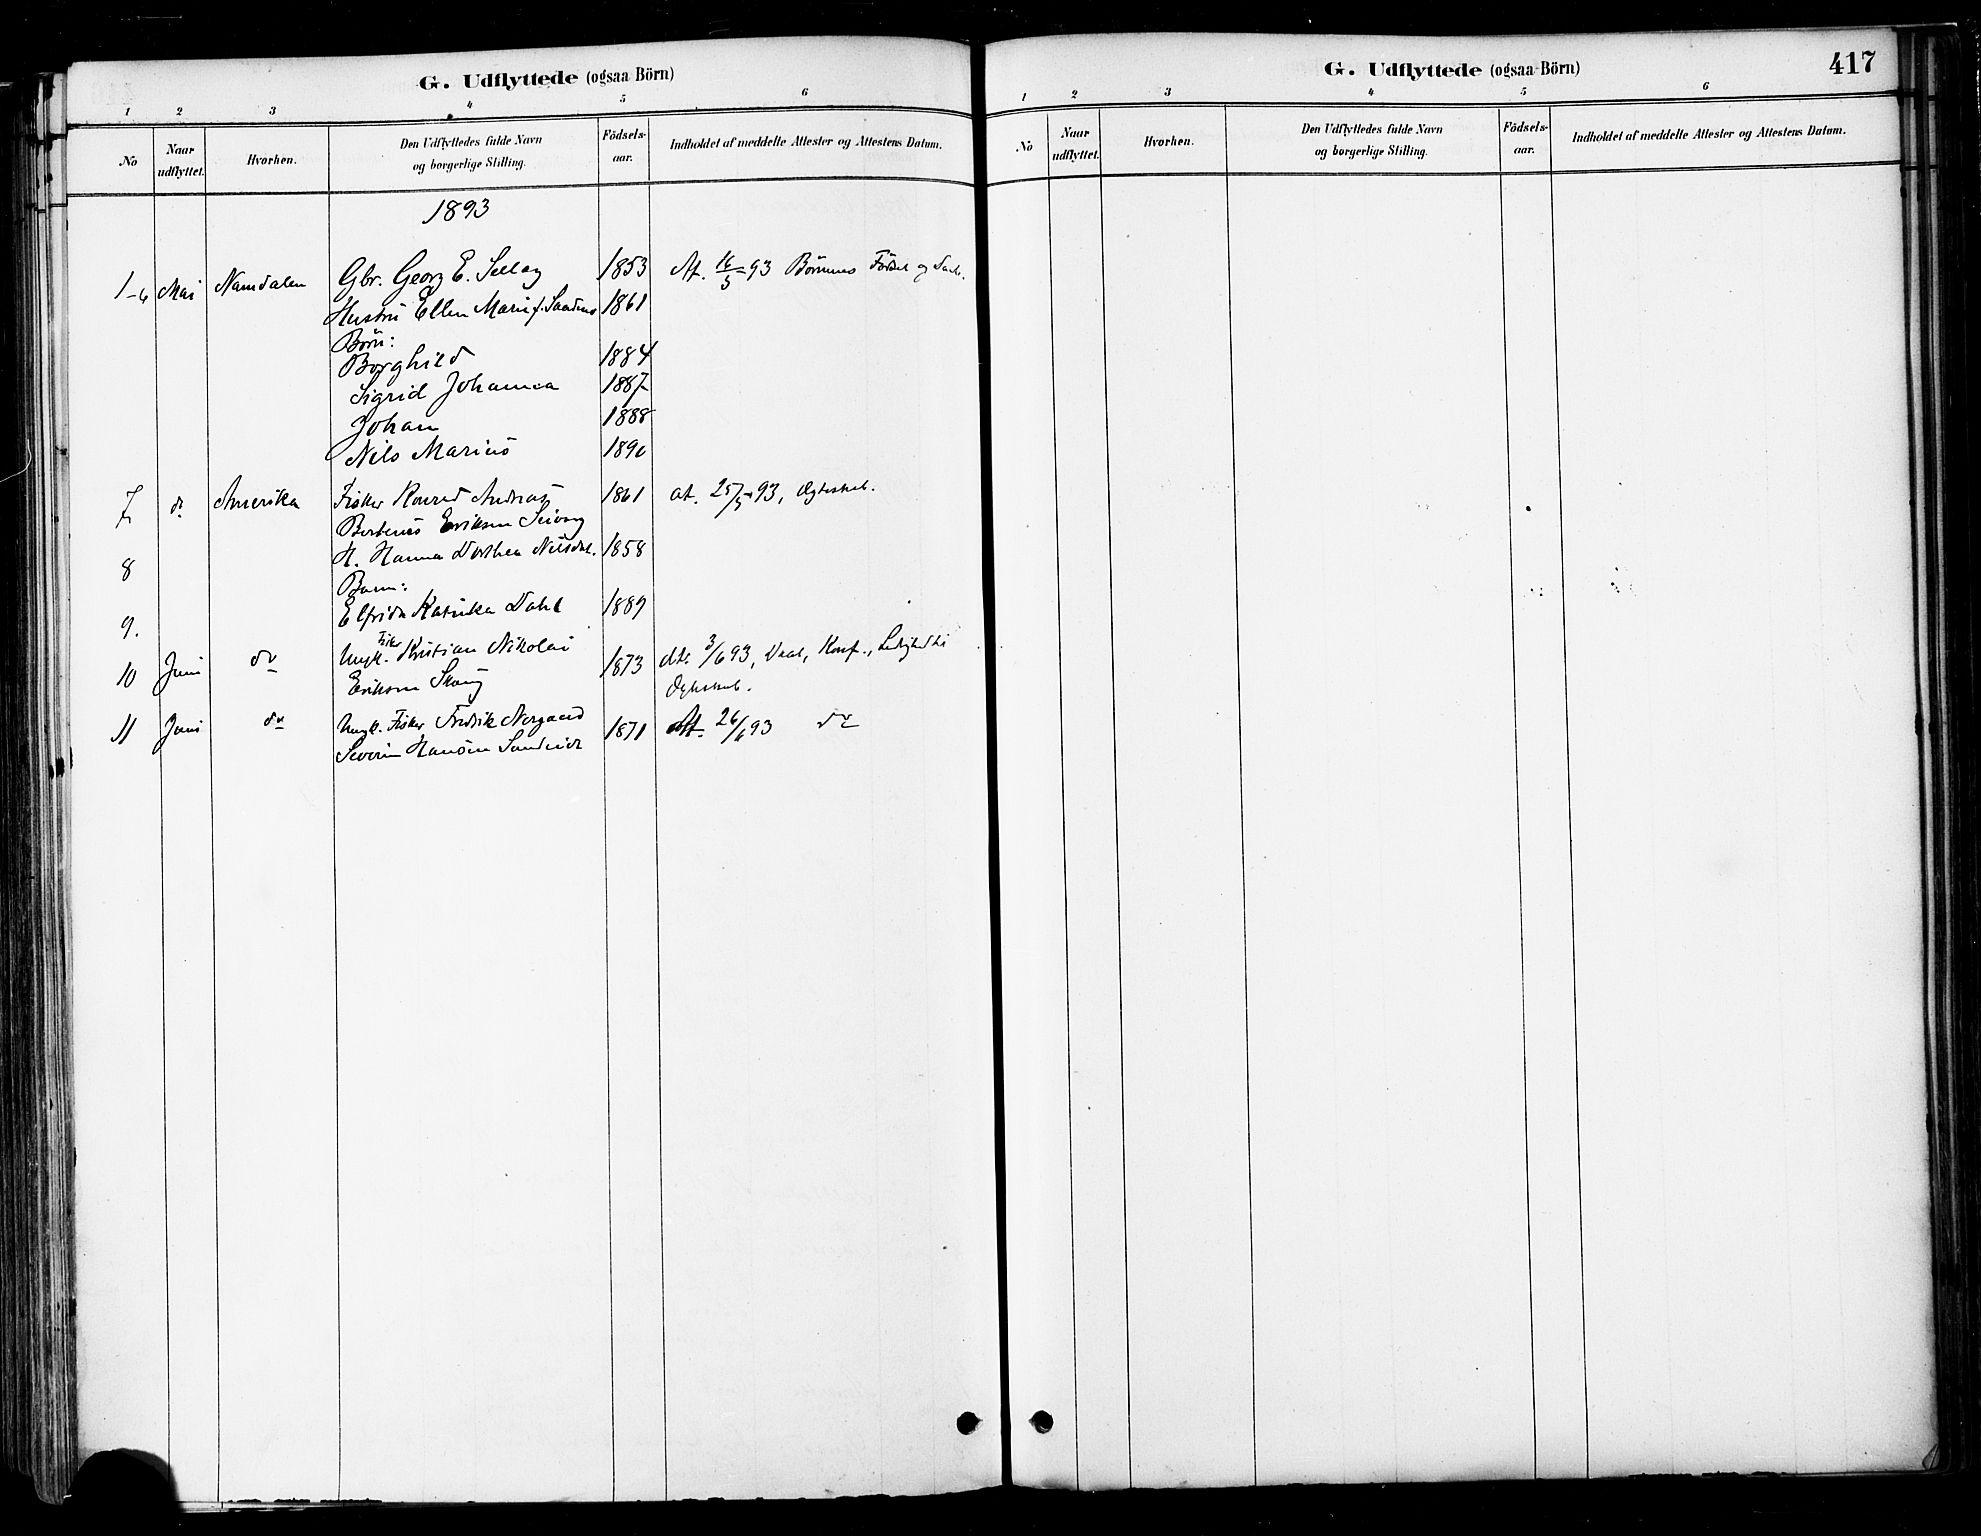 SAT, Ministerialprotokoller, klokkerbøker og fødselsregistre - Nordland, 802/L0054: Ministerialbok nr. 802A01, 1879-1893, s. 417